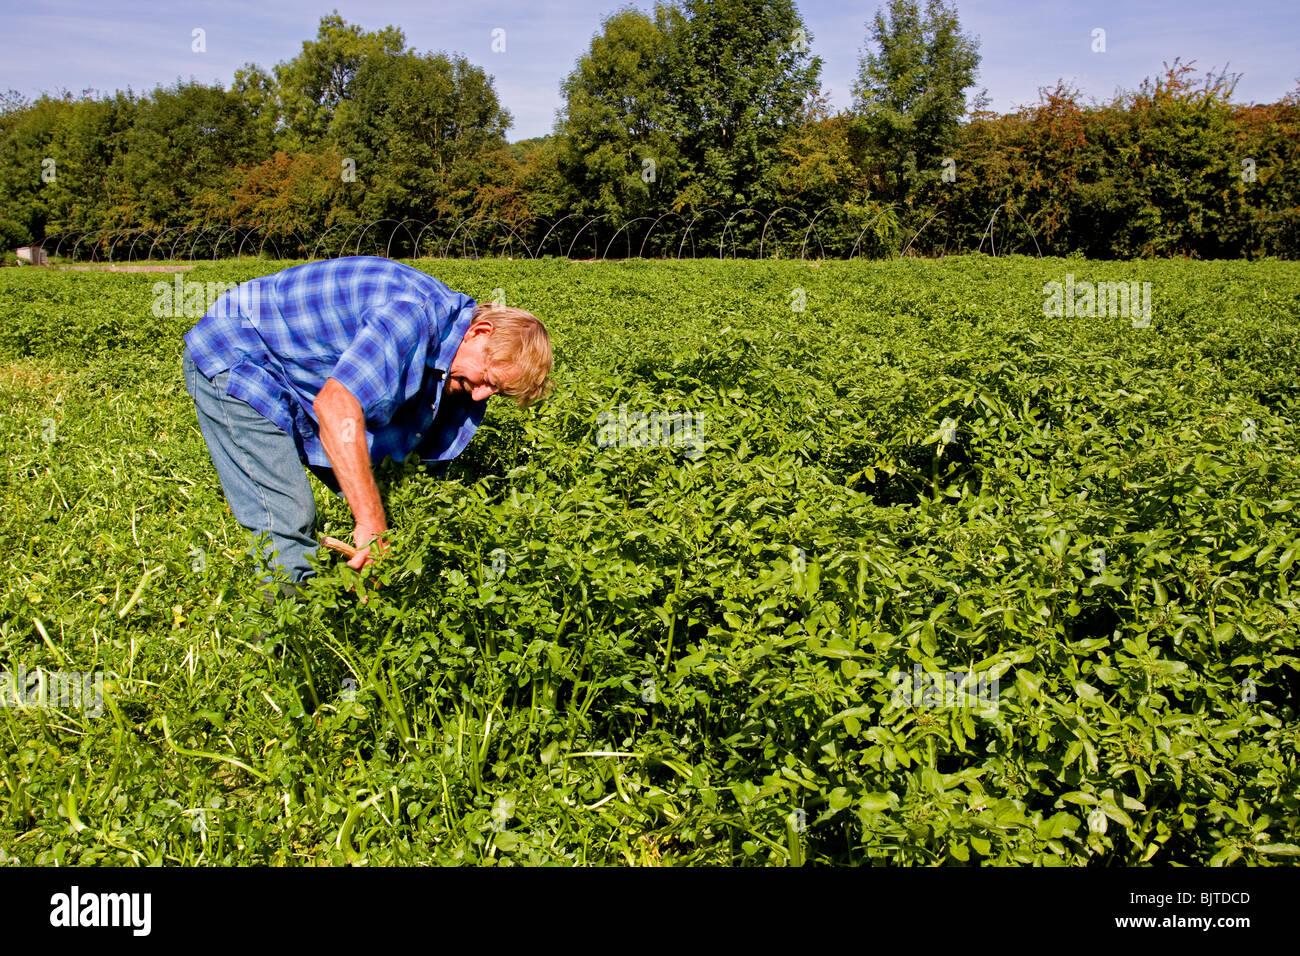 Berros tradicional agricultura Valle de Ajedrez Hertfordshire Chilterns Imagen De Stock